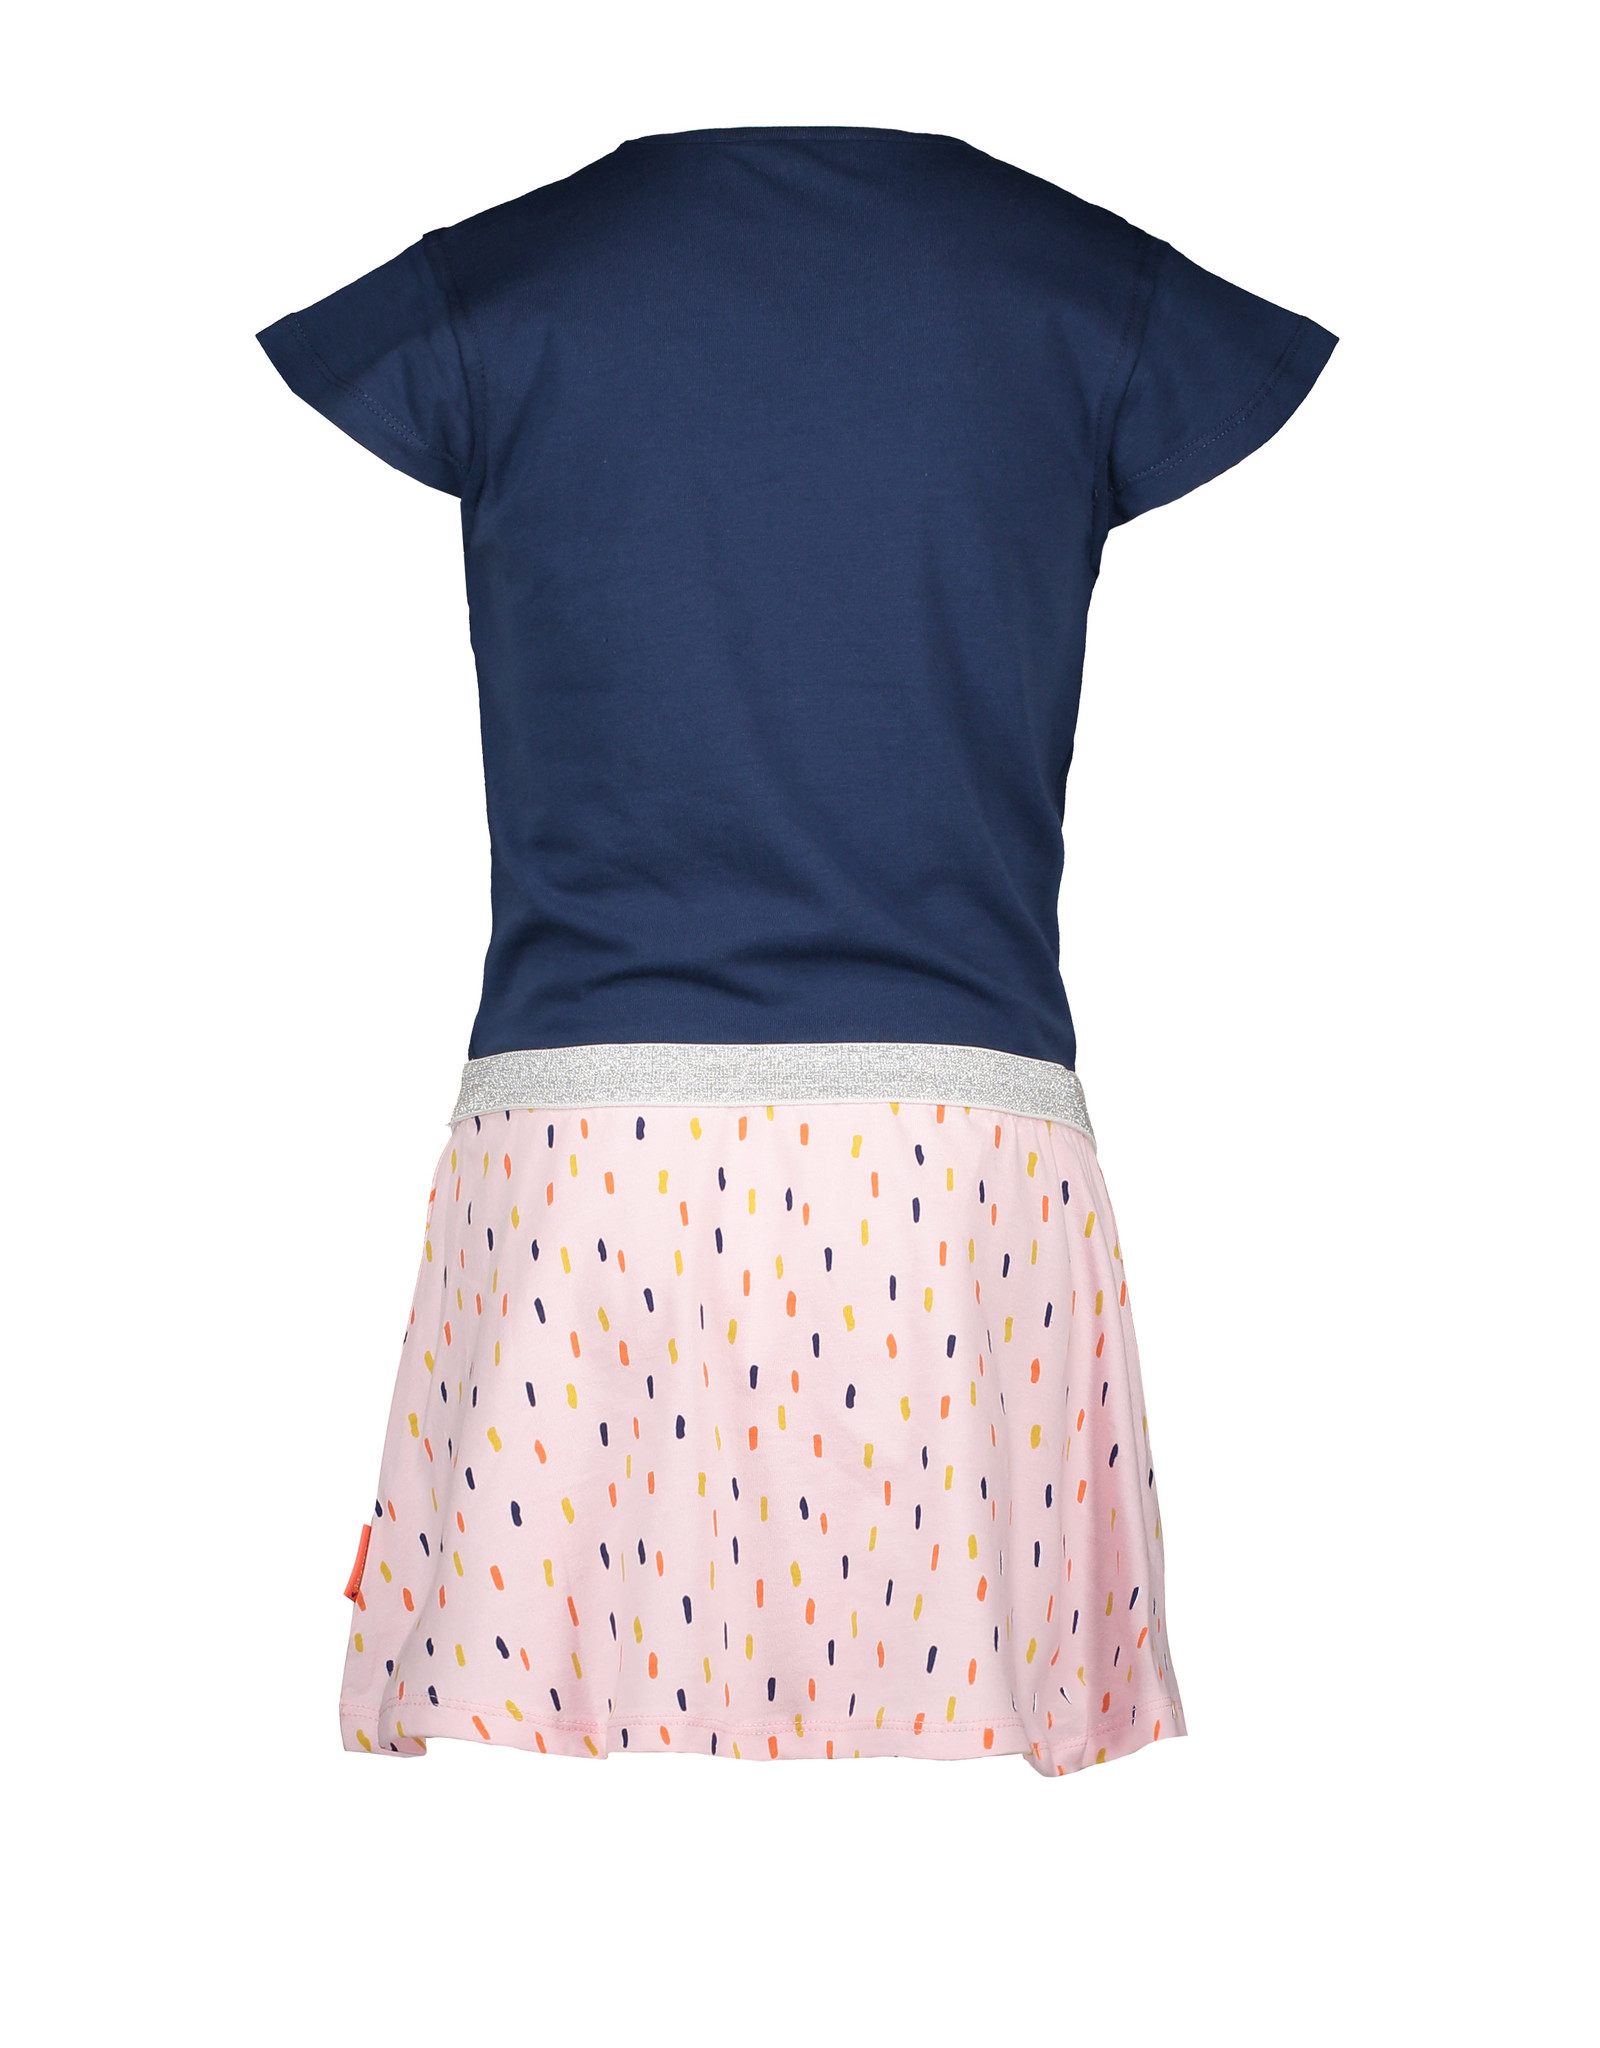 Bampidano Bampidano Junior Girls multi dress Delfine plain top + AO skirt with elastic waist NATURE